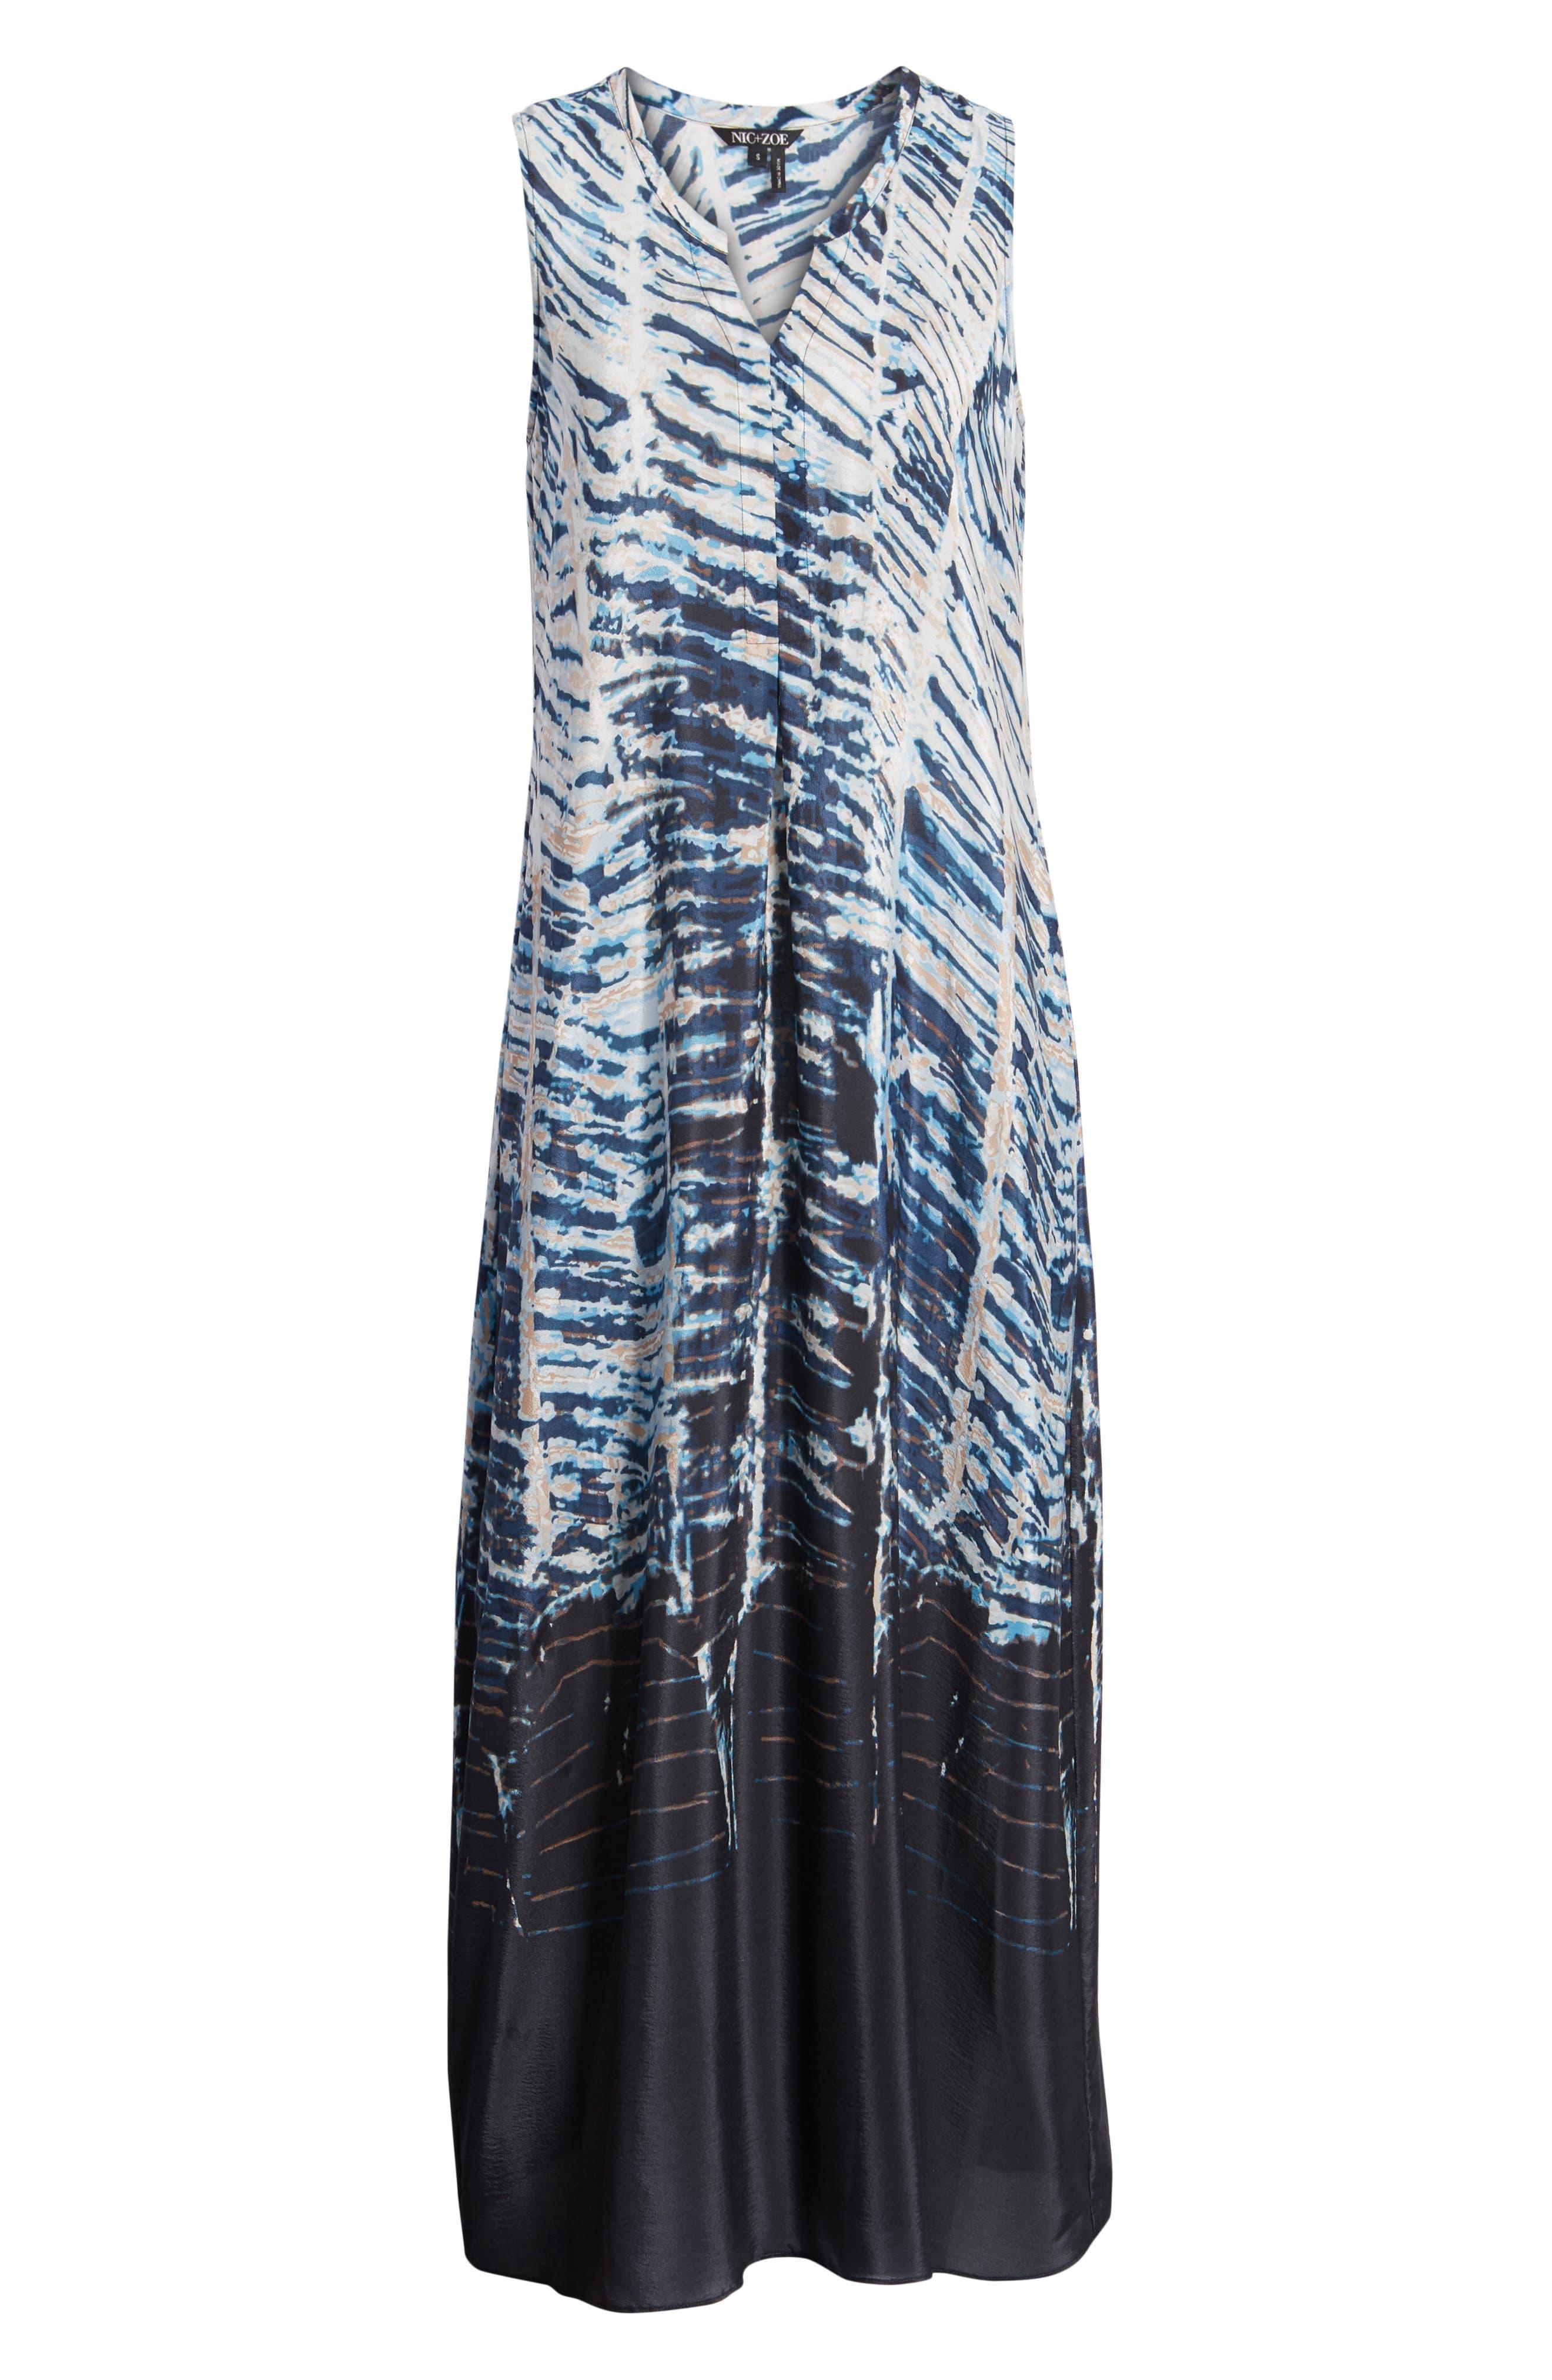 Tinango Tank Dress,                             Alternate thumbnail 7, color,                             490